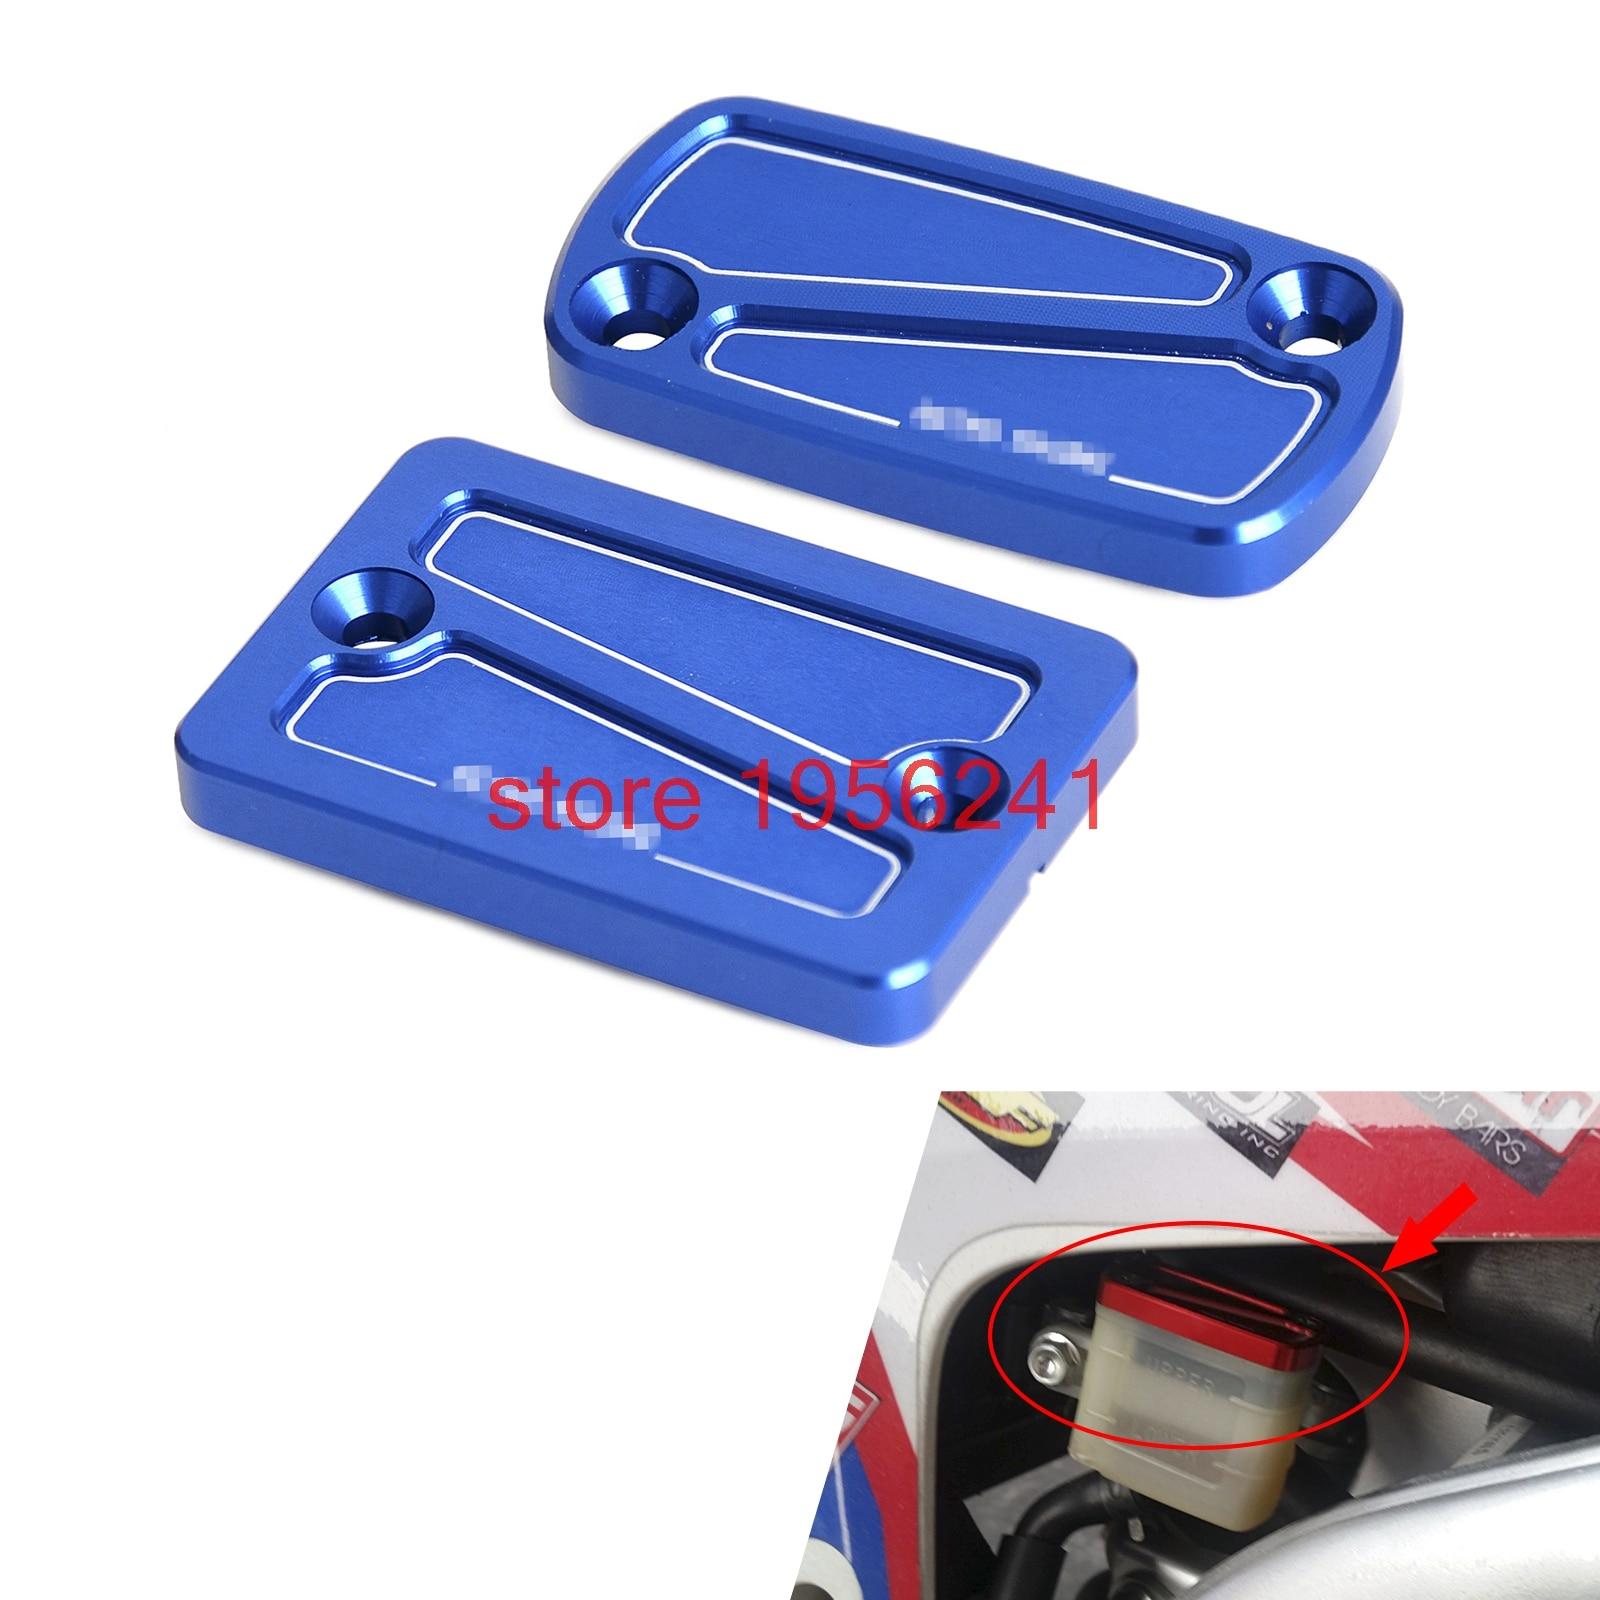 CNC Front & Rear Brake Reservoir Fluid Cover Cap For Honda CRF250L CRF250M 2012 2013 2014 2015 CRF250 L/M CRF 250L 250M